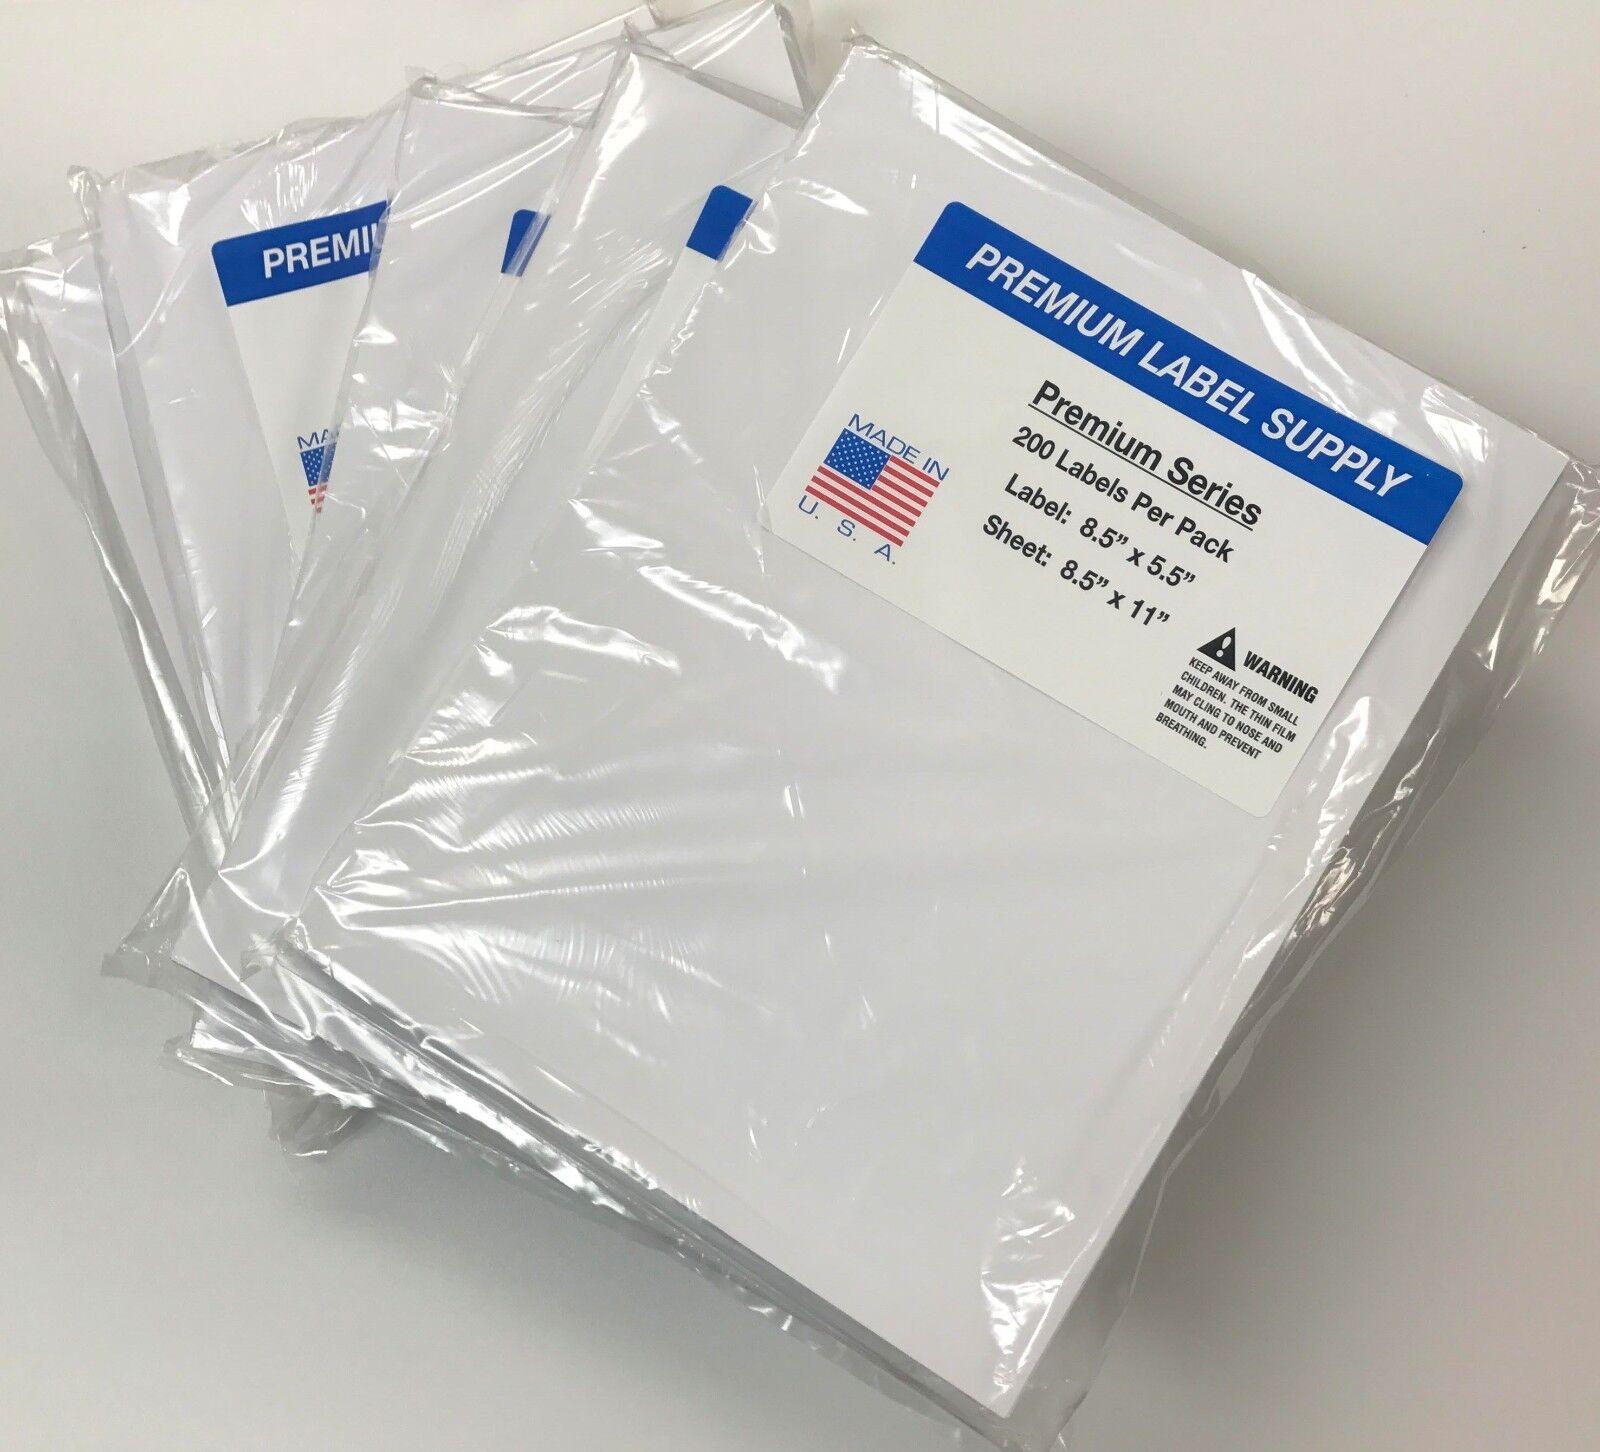 "1000 Premium 8.5 ""X 5.5"" Half Sheet Self Adhesive Shipping Labels -PLS Brand- - C'mon » TikTokJa Video Downloader"